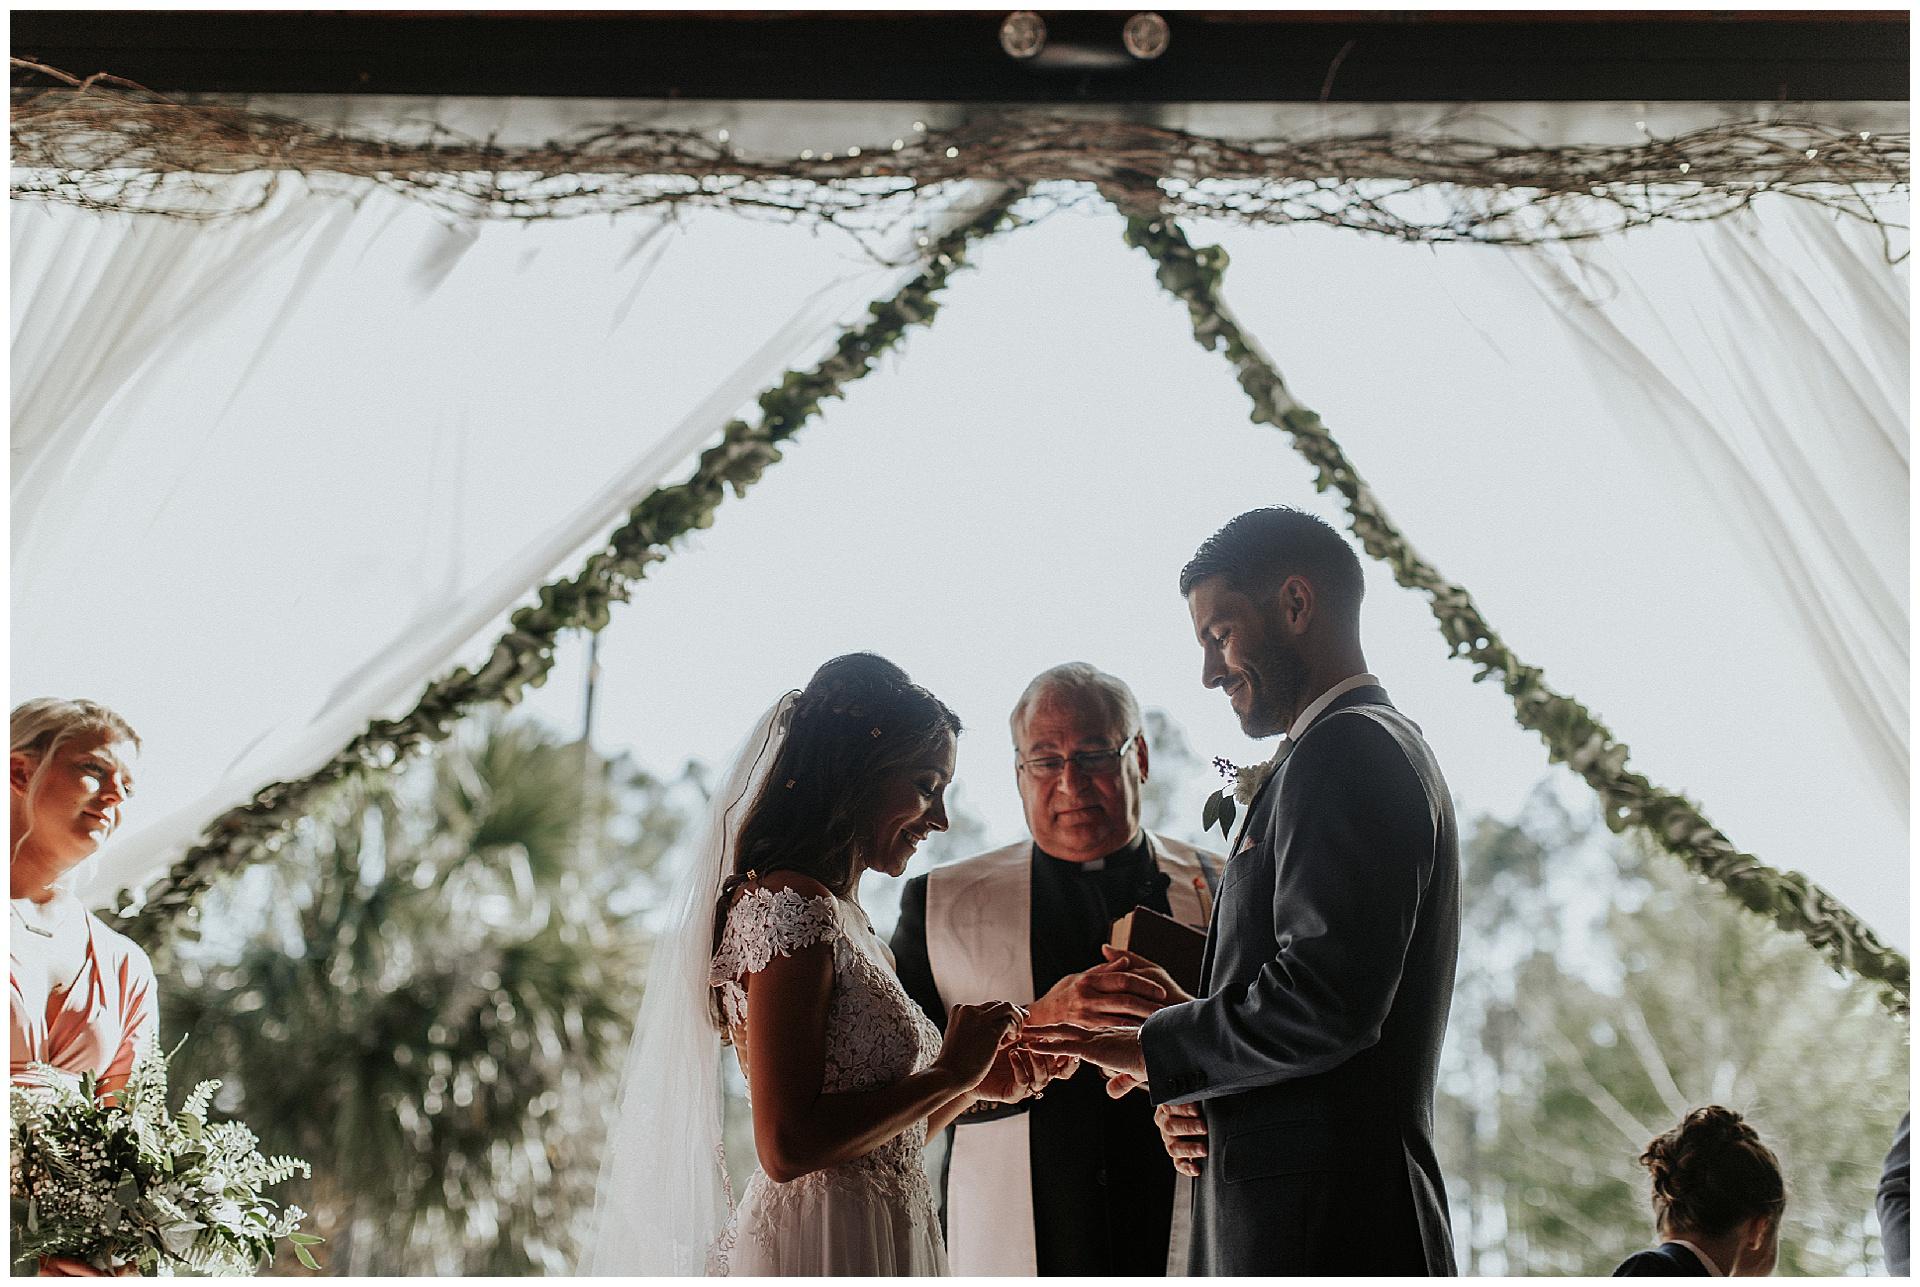 st augustine wedding photographer_mia dimare photography23.jpg